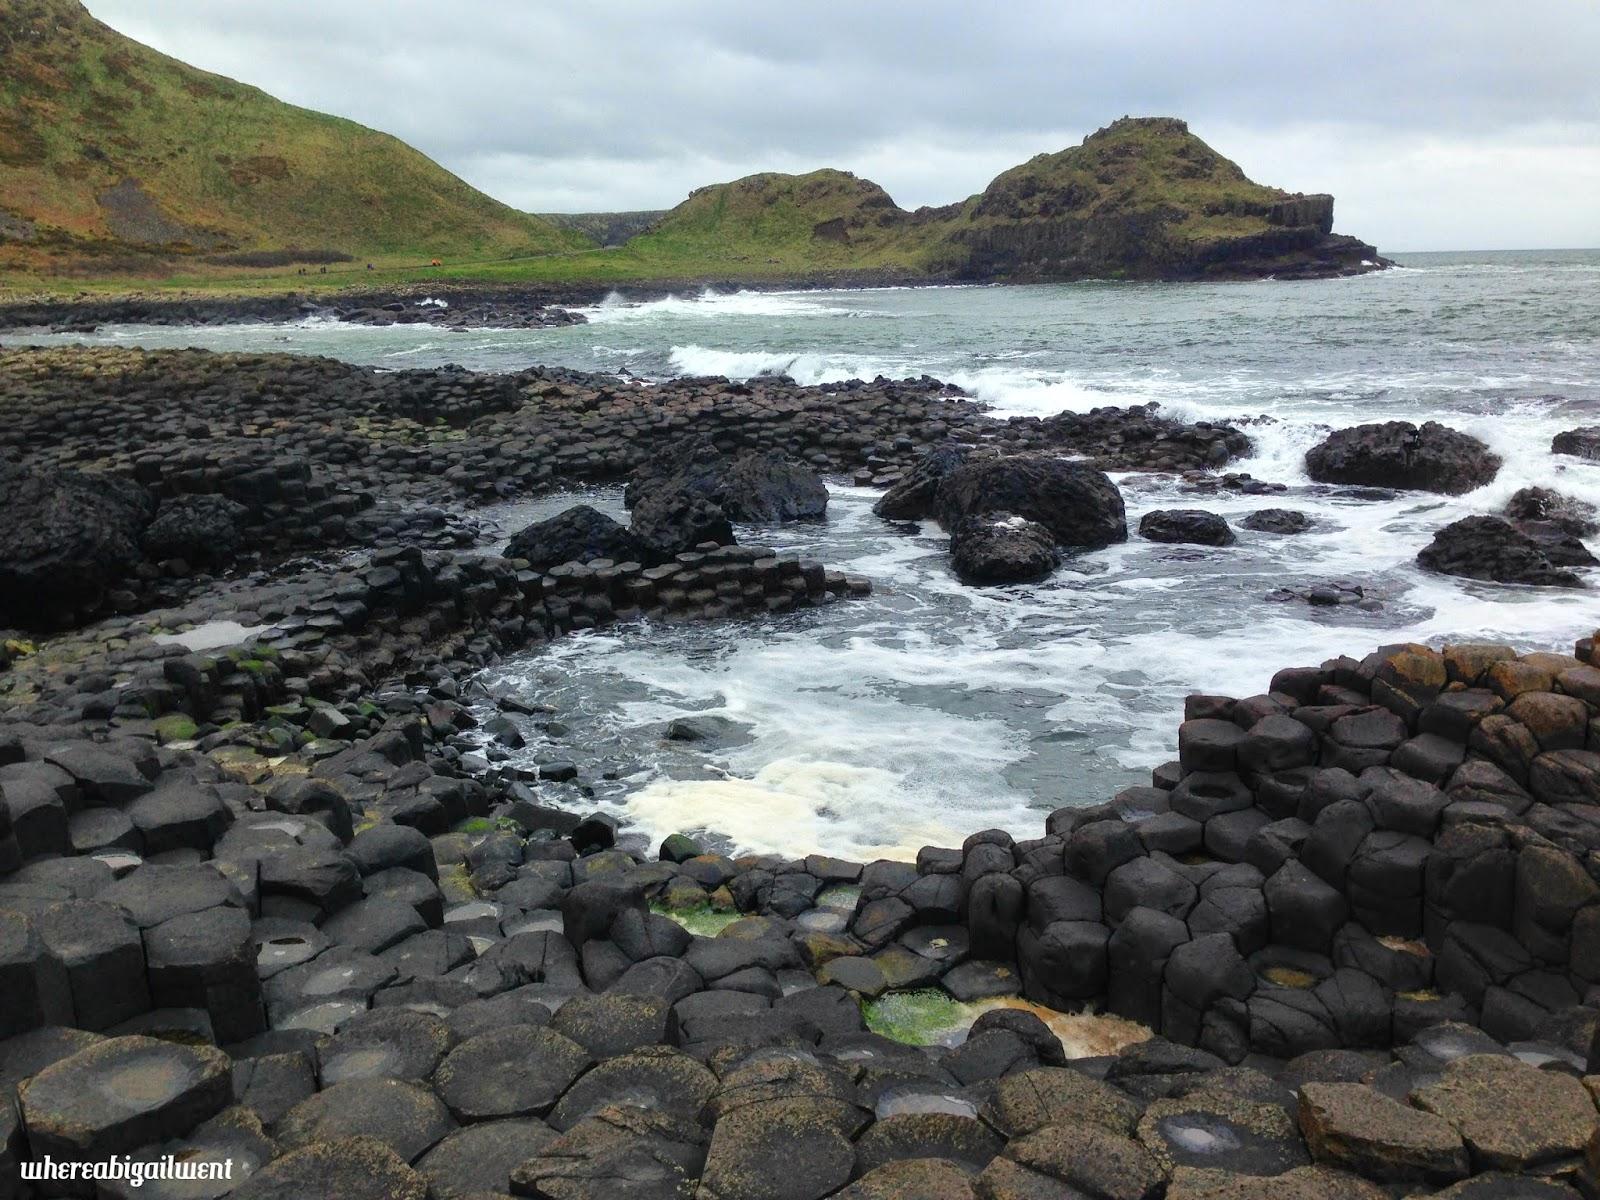 Honeycomb Basalt Stones